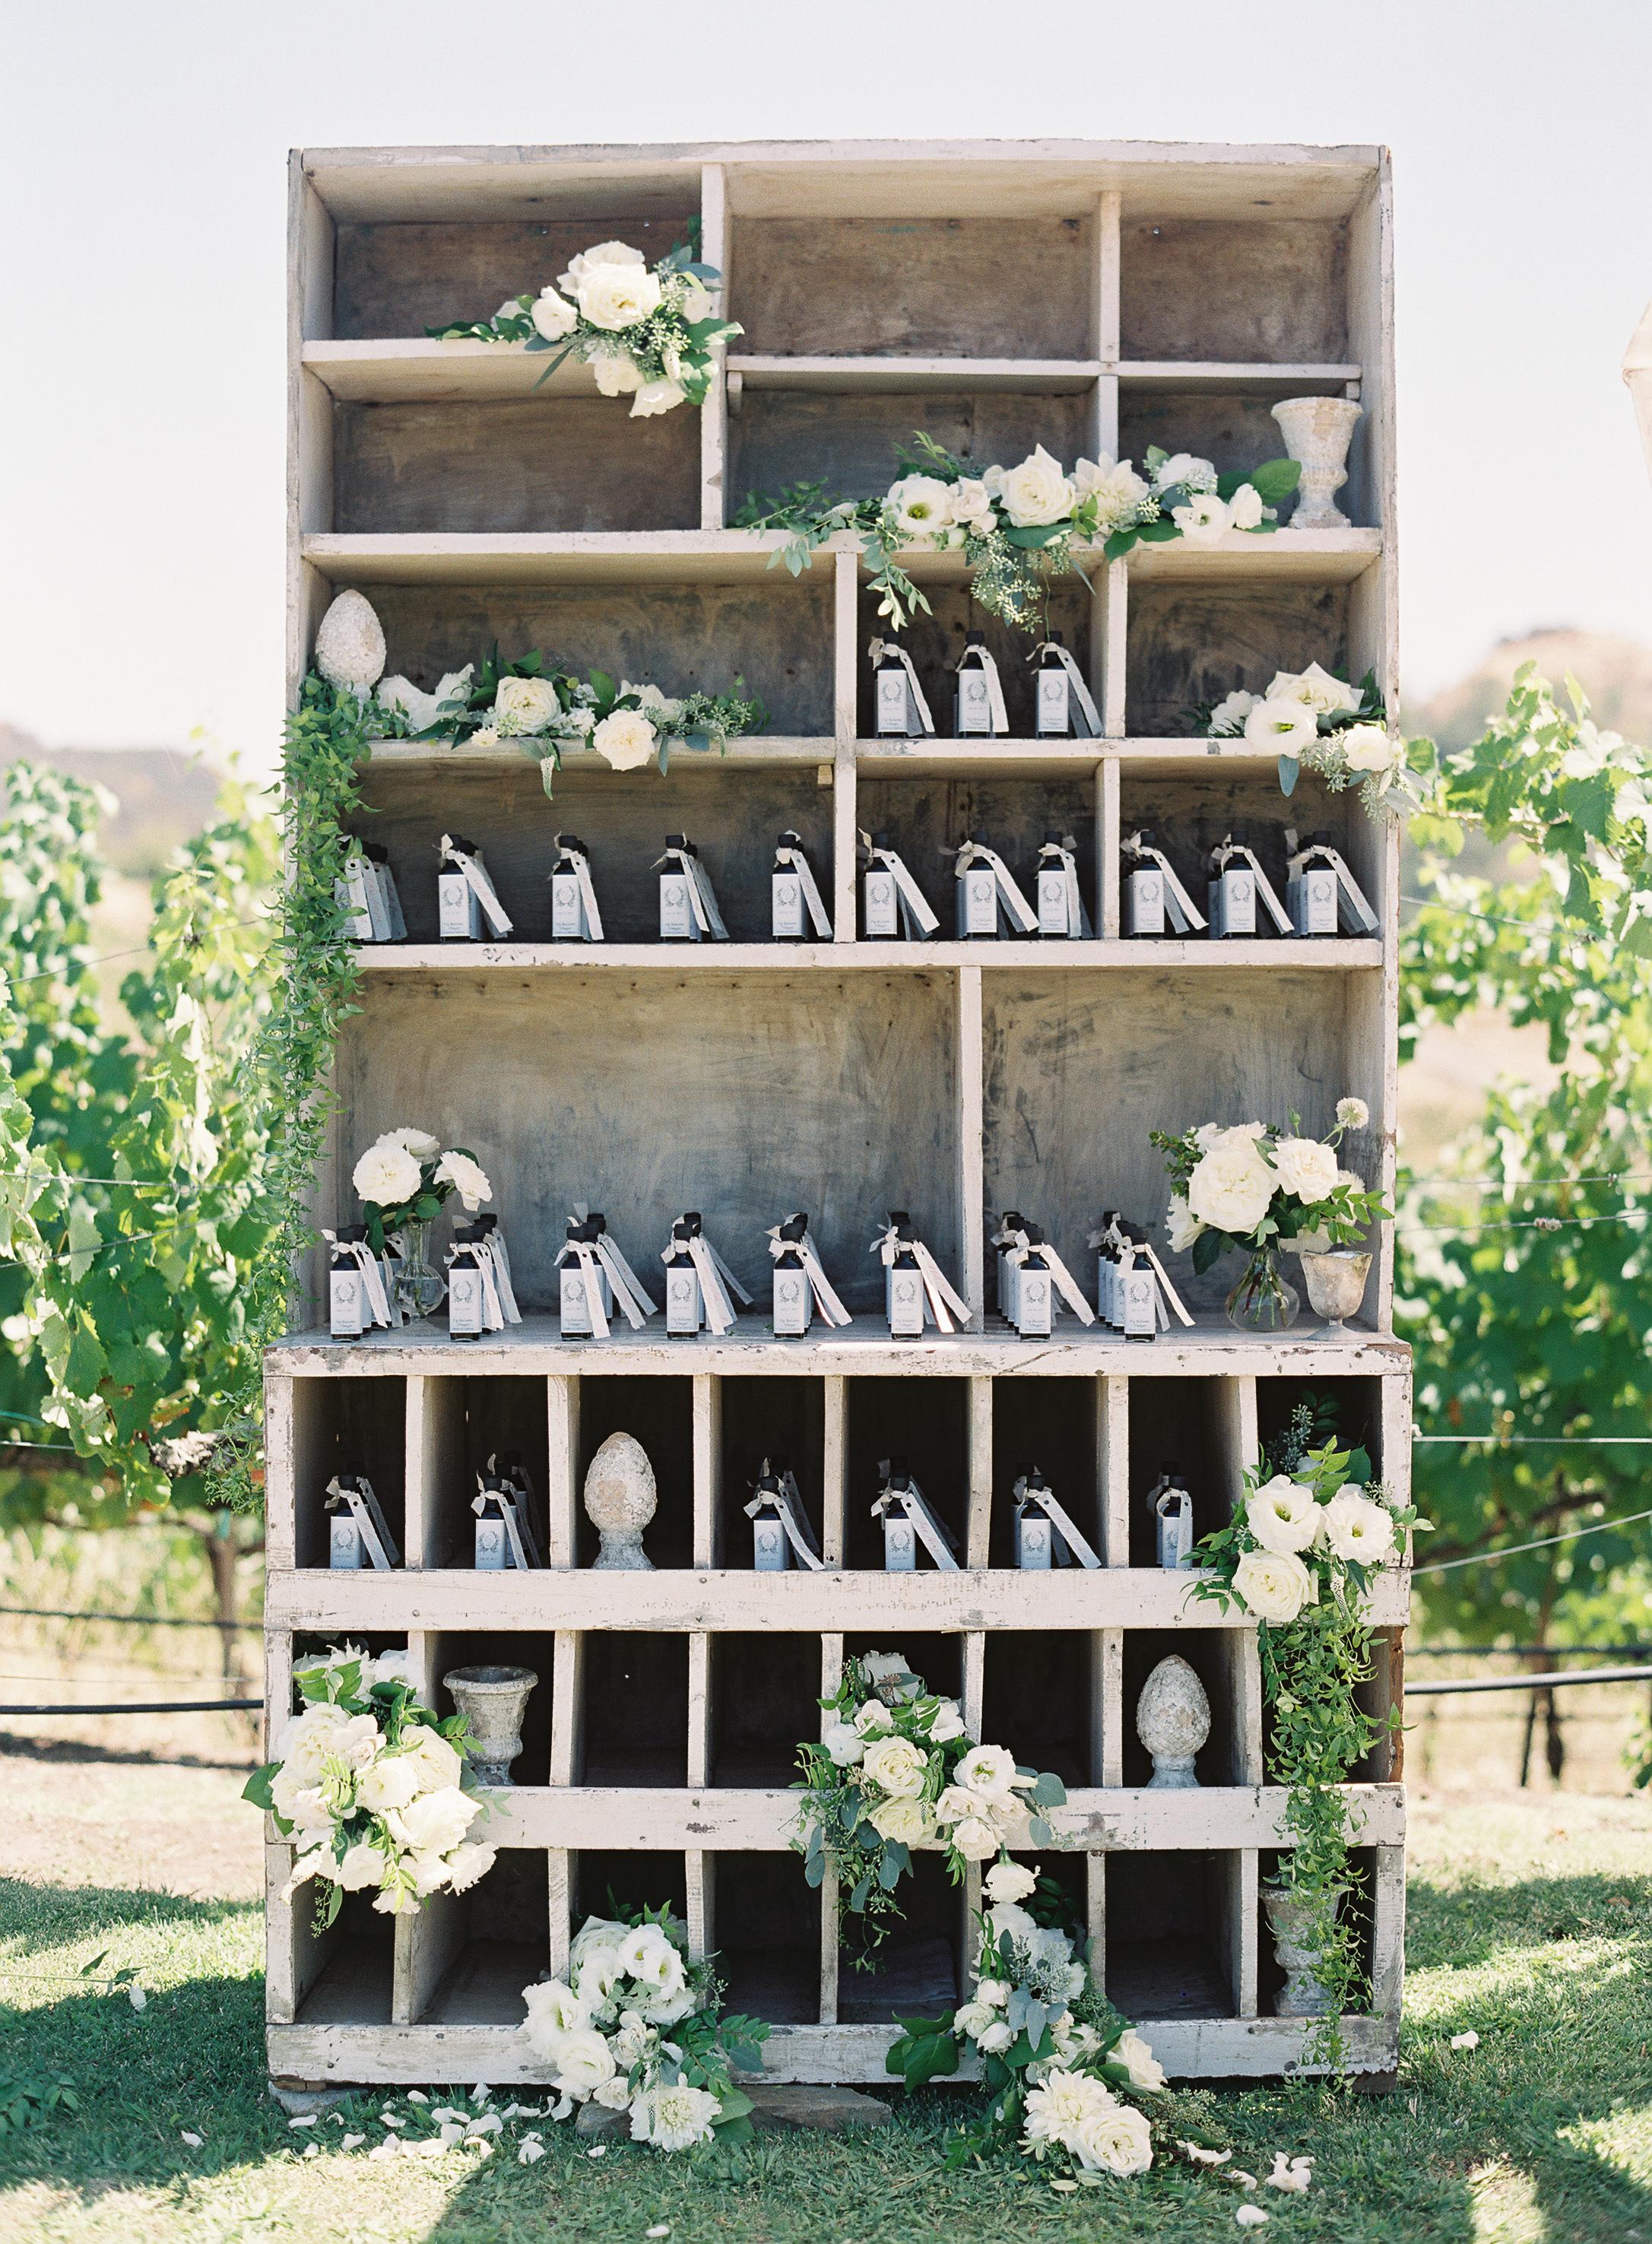 favor display with floral arrangement